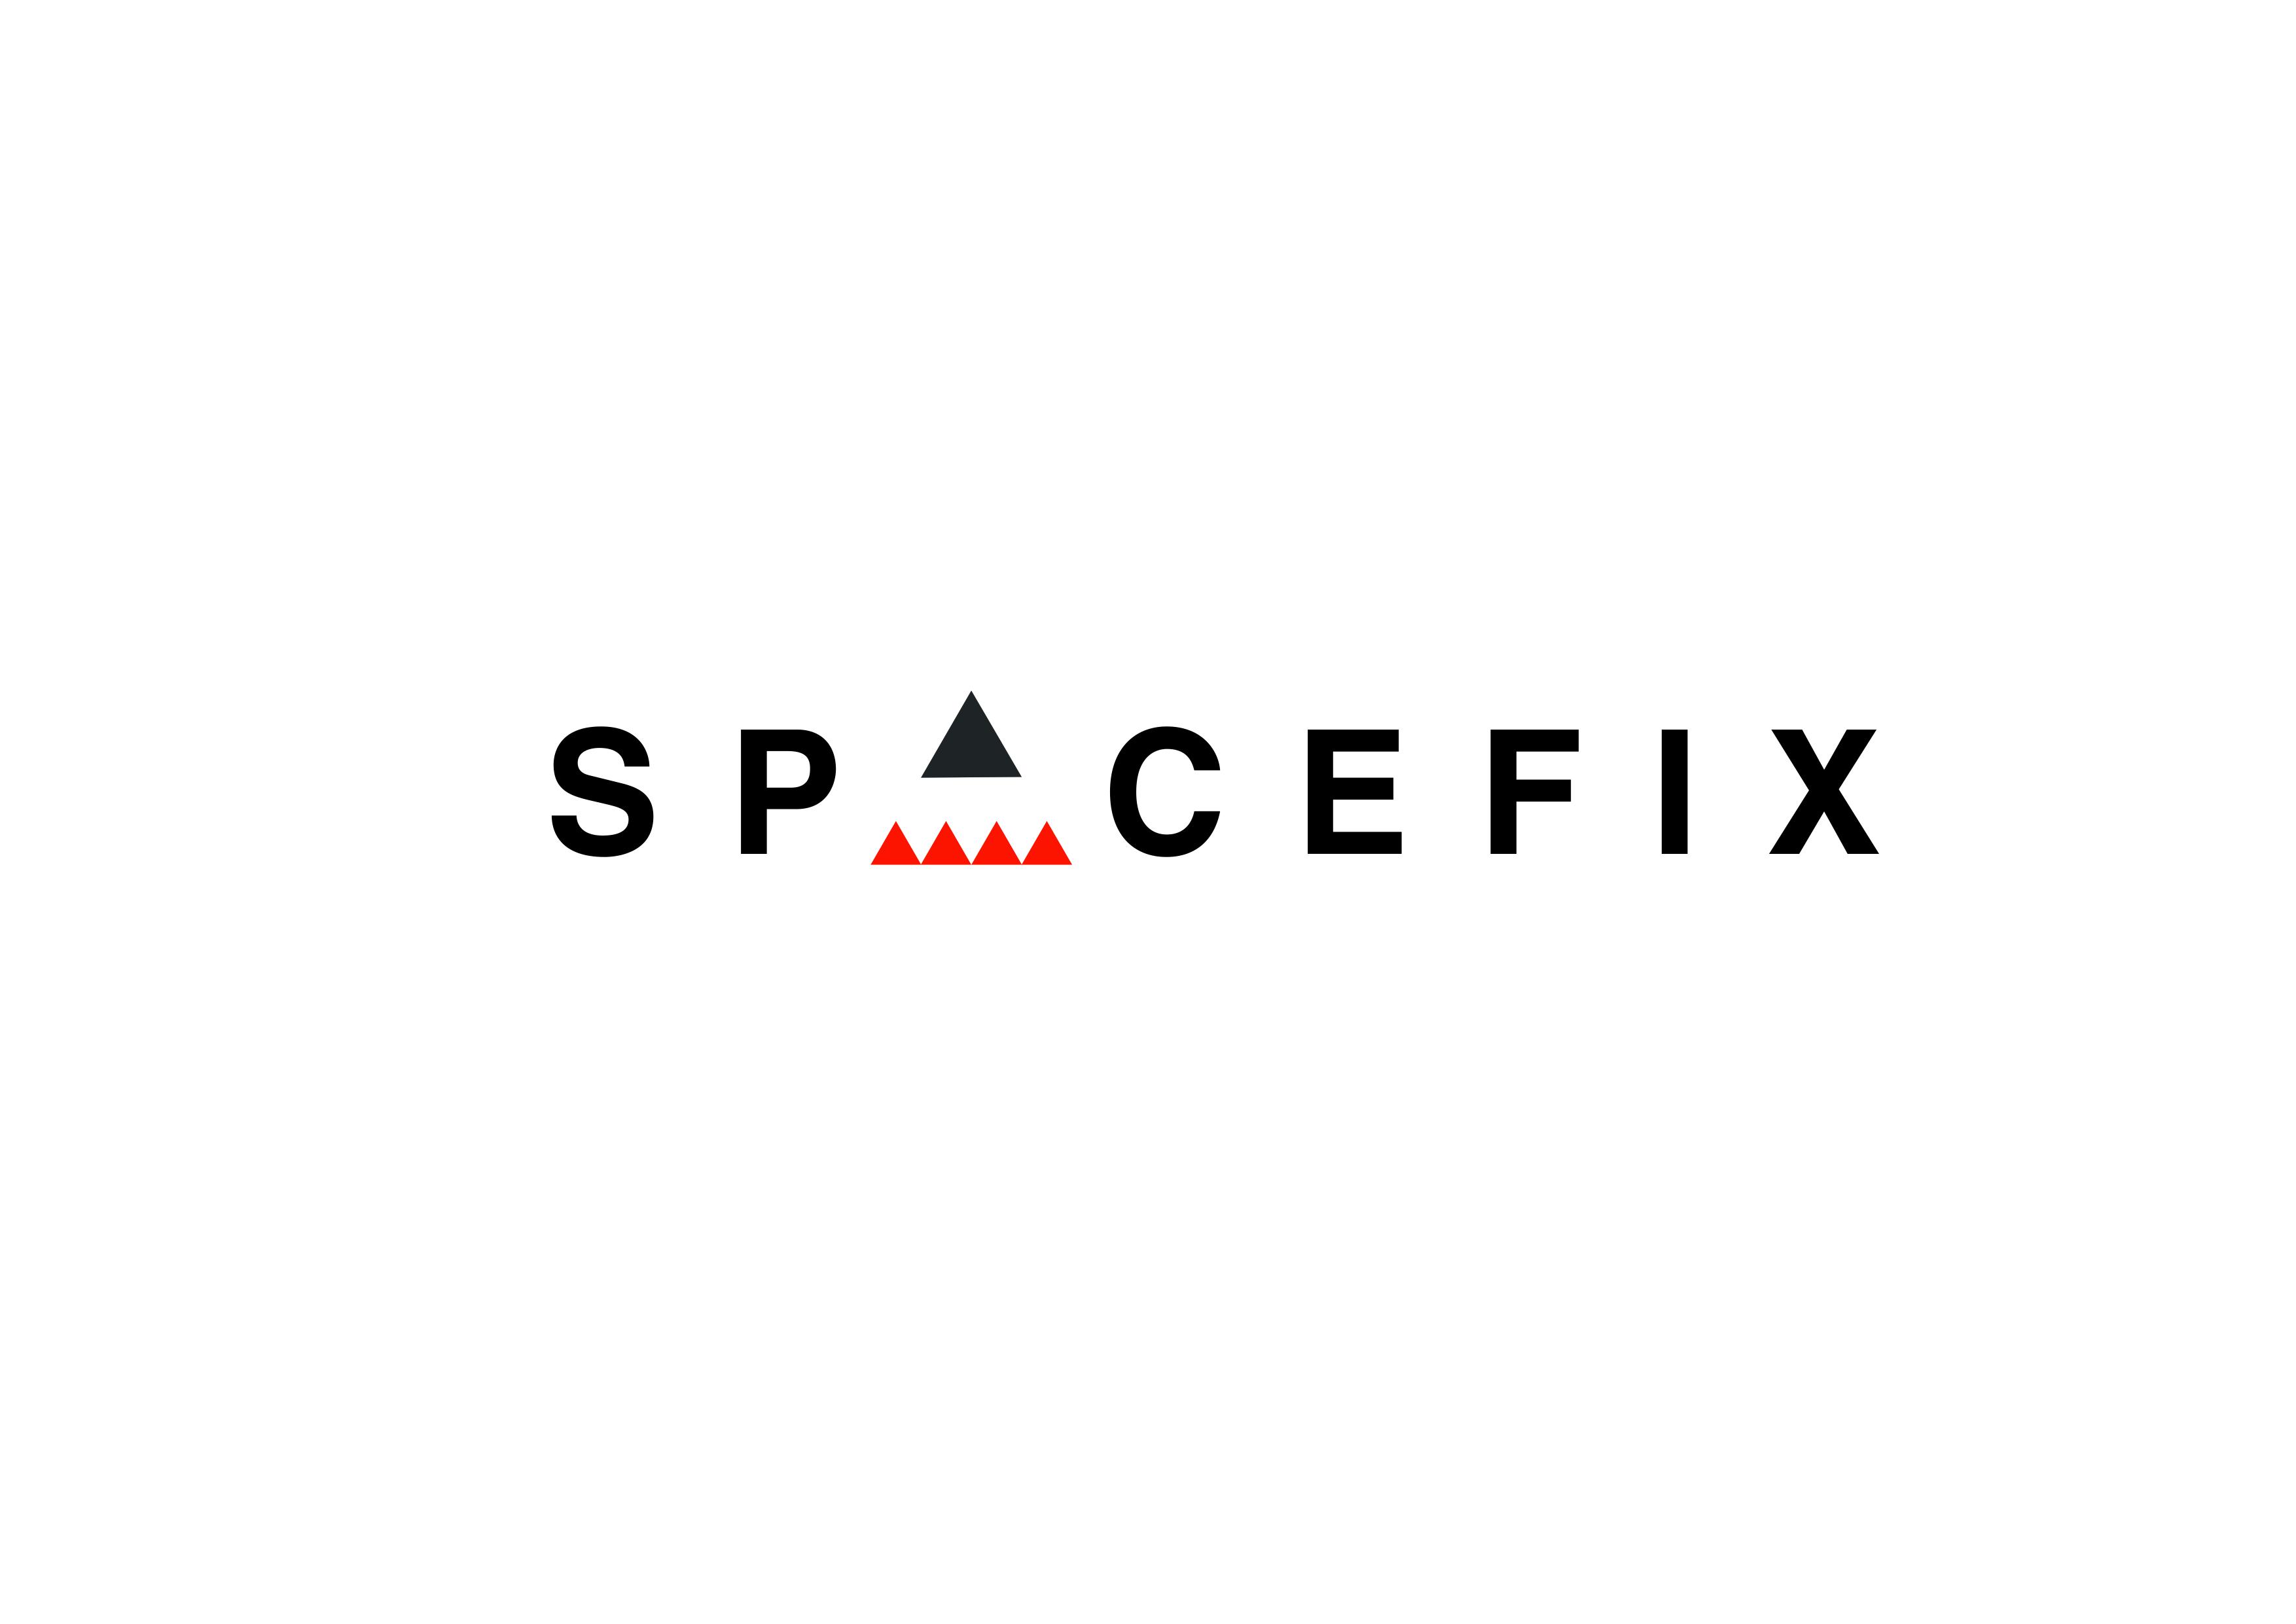 Spacefix